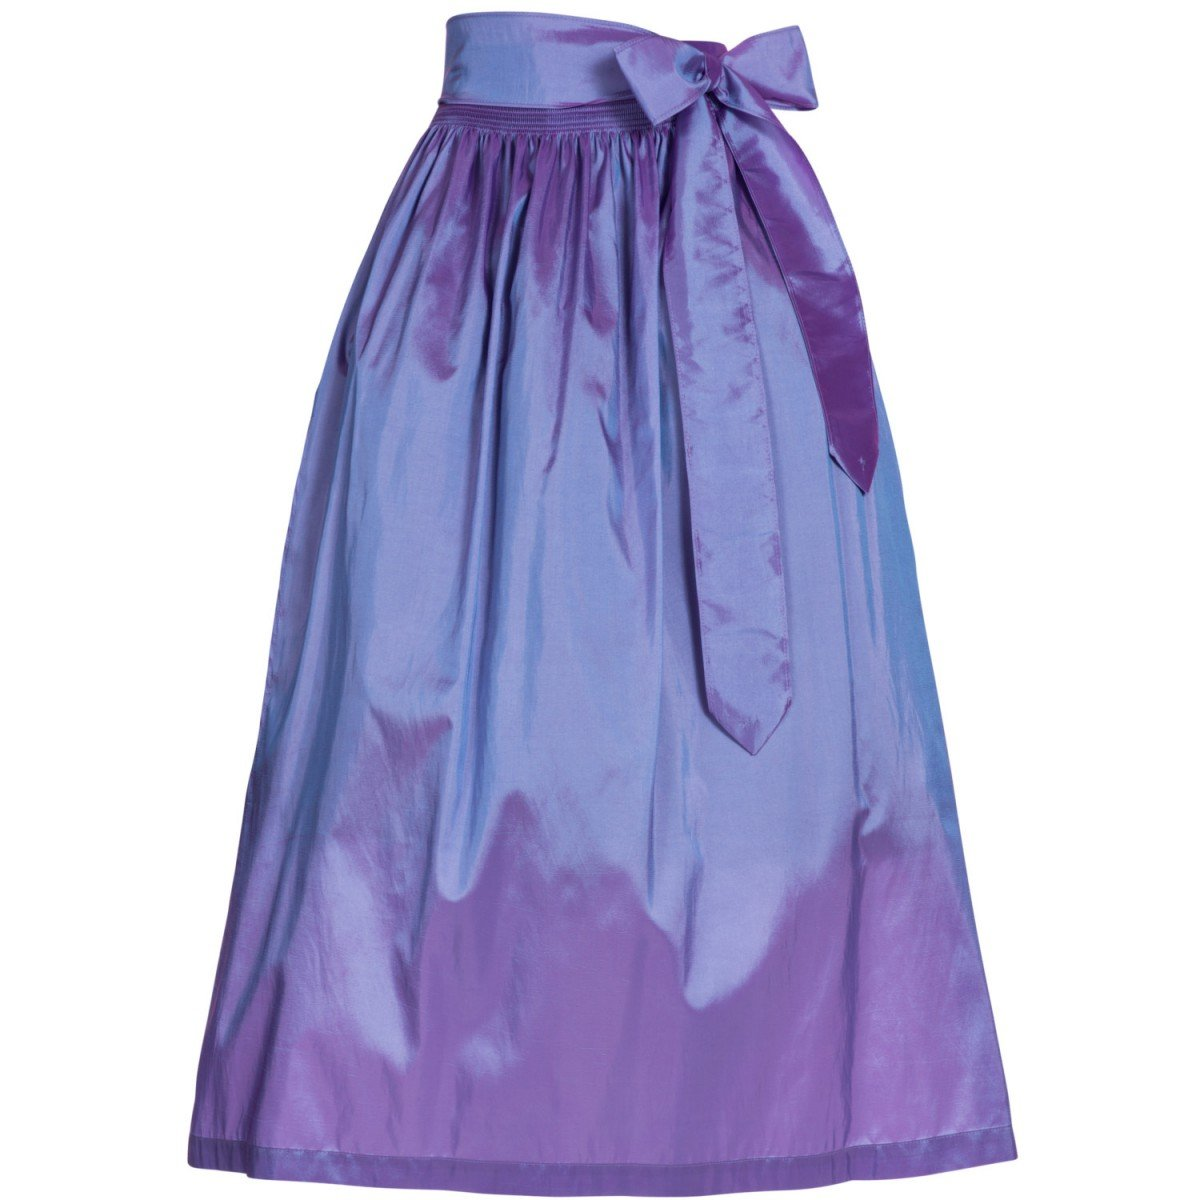 Country Line Damen Trachten-Mode Dirndlschürze in Lila Traditionell Größe:M Farbe:Lila